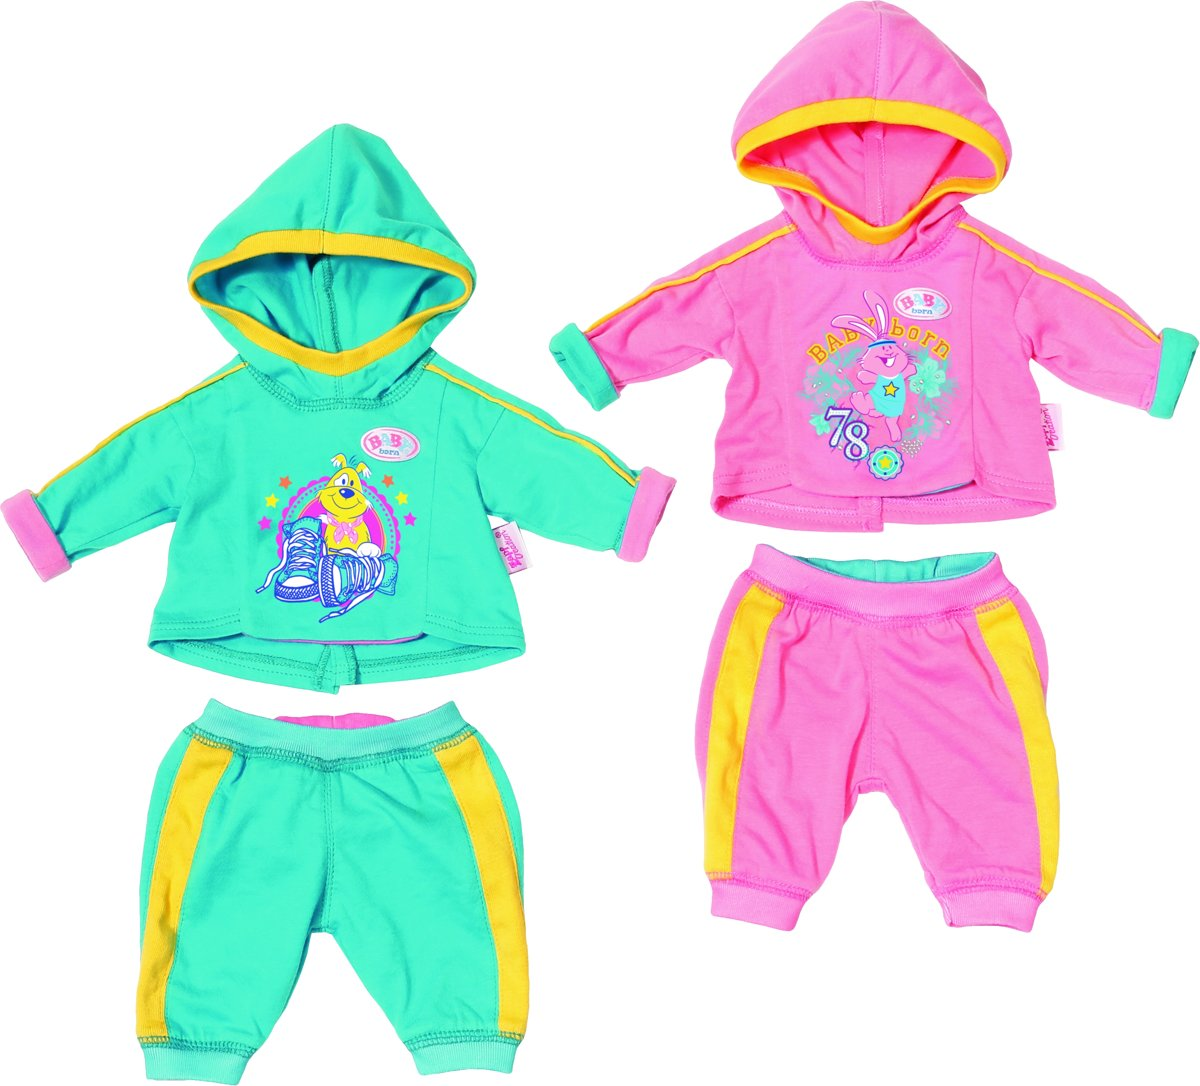 Baby Born Jogging set